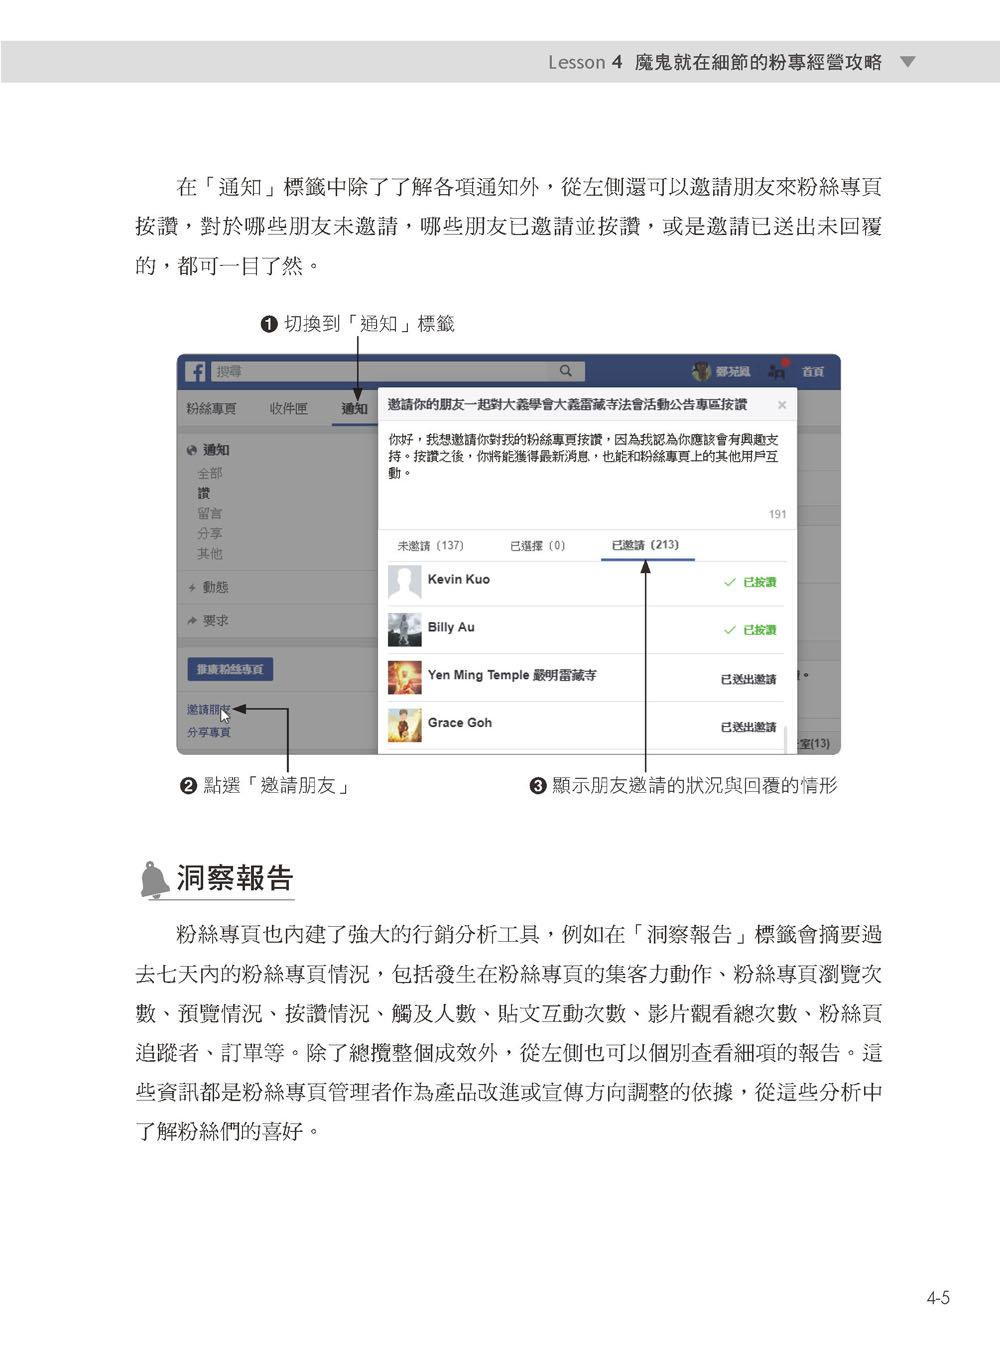 Facebook 互動行銷:社群口碑經營新思路+廣告投放如何有成效,想做好臉書行銷,操作心法就在這!-preview-2